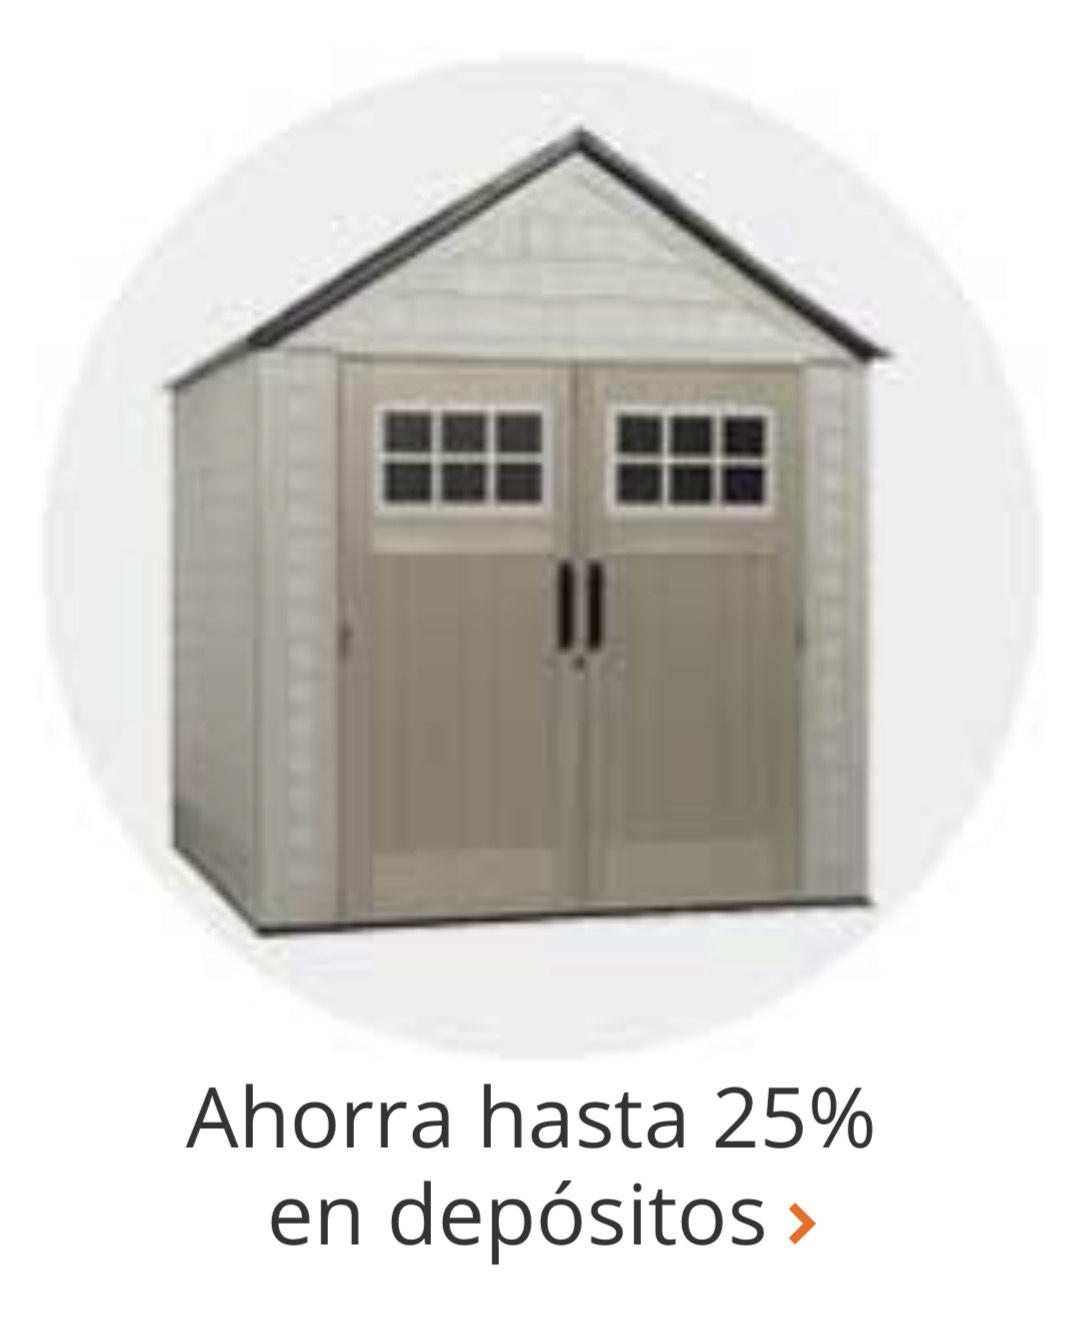 25% dicto. Home Depot Casas/Almacenamiento para exterior con 25% dicto.